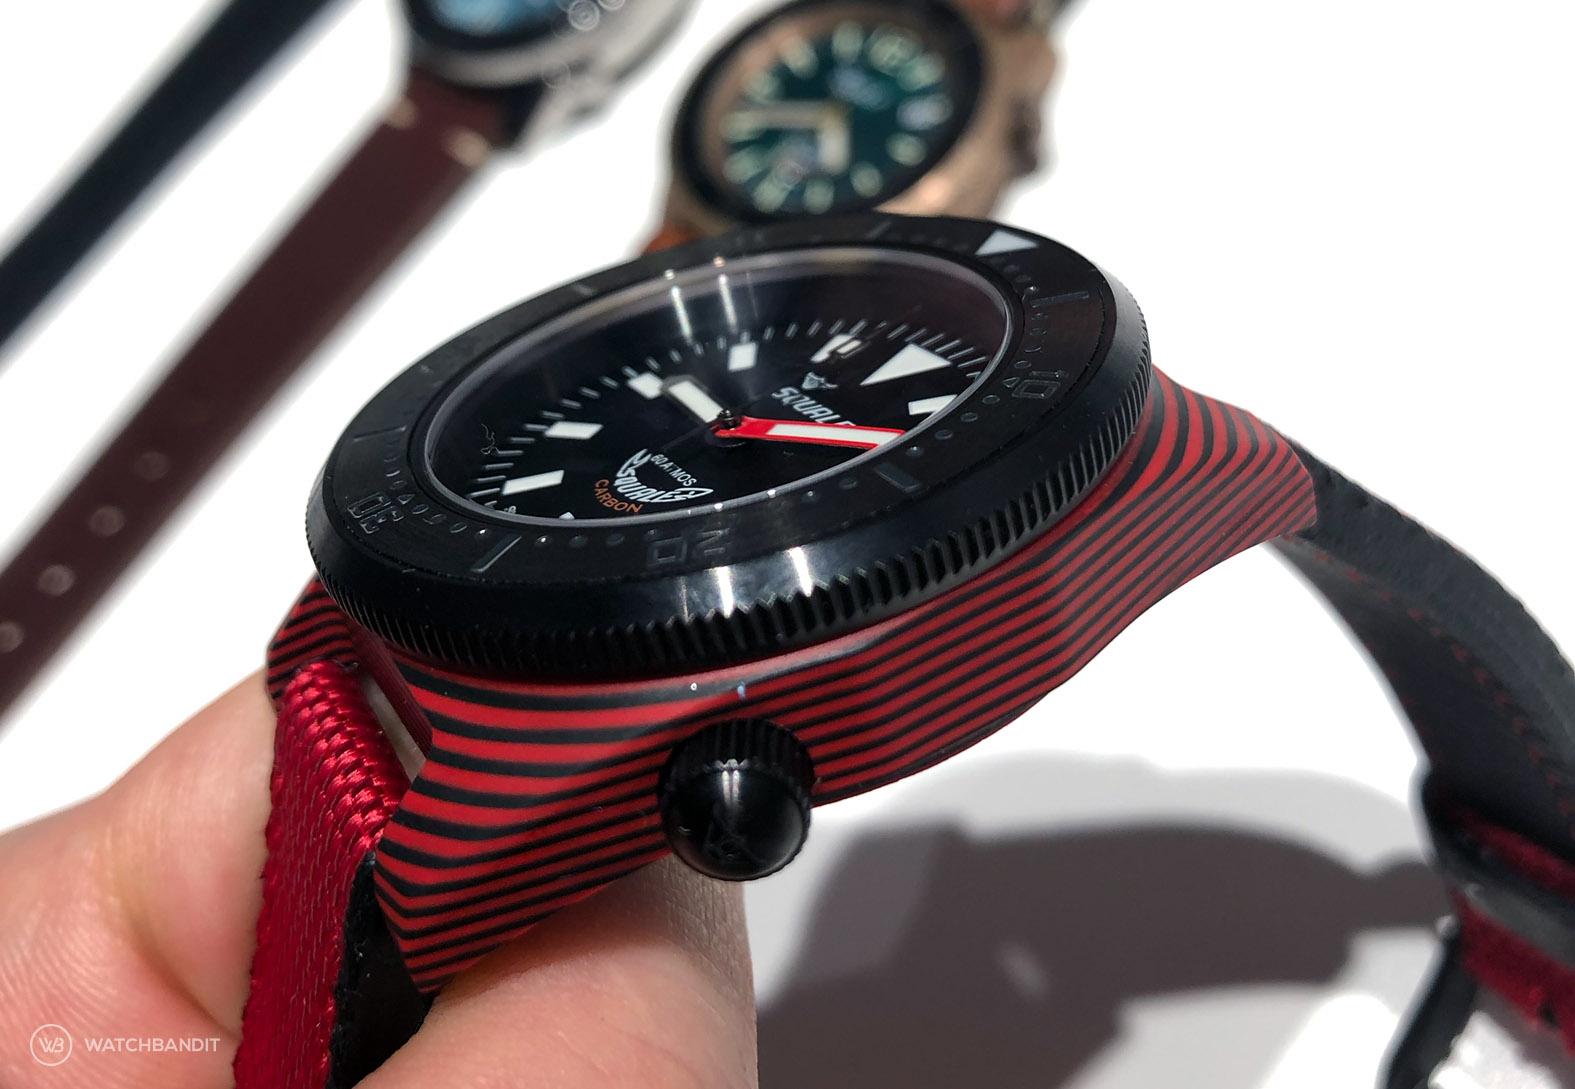 WatchBandit Squale T183 carbon fiber red